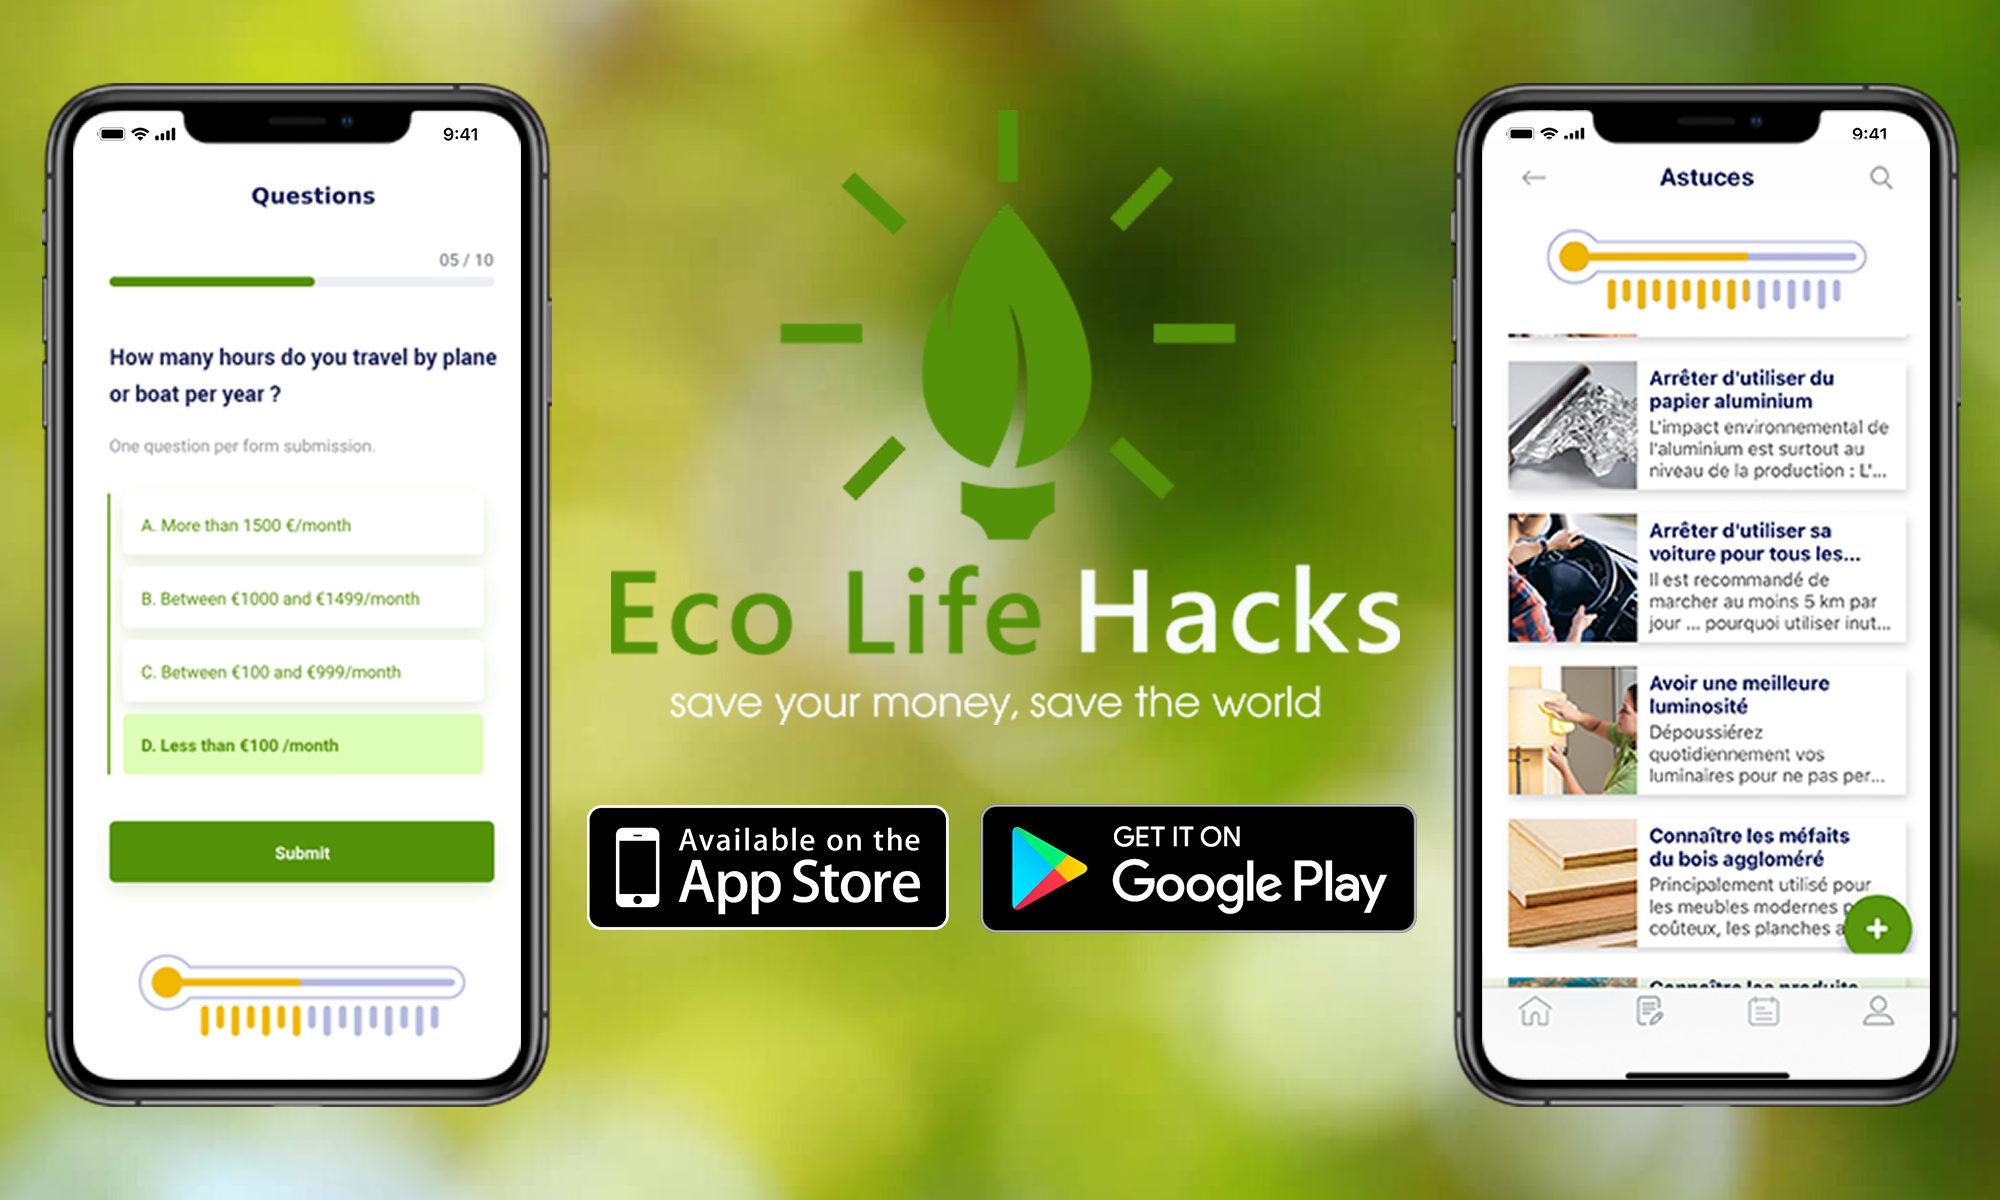 Eco Life Hacks